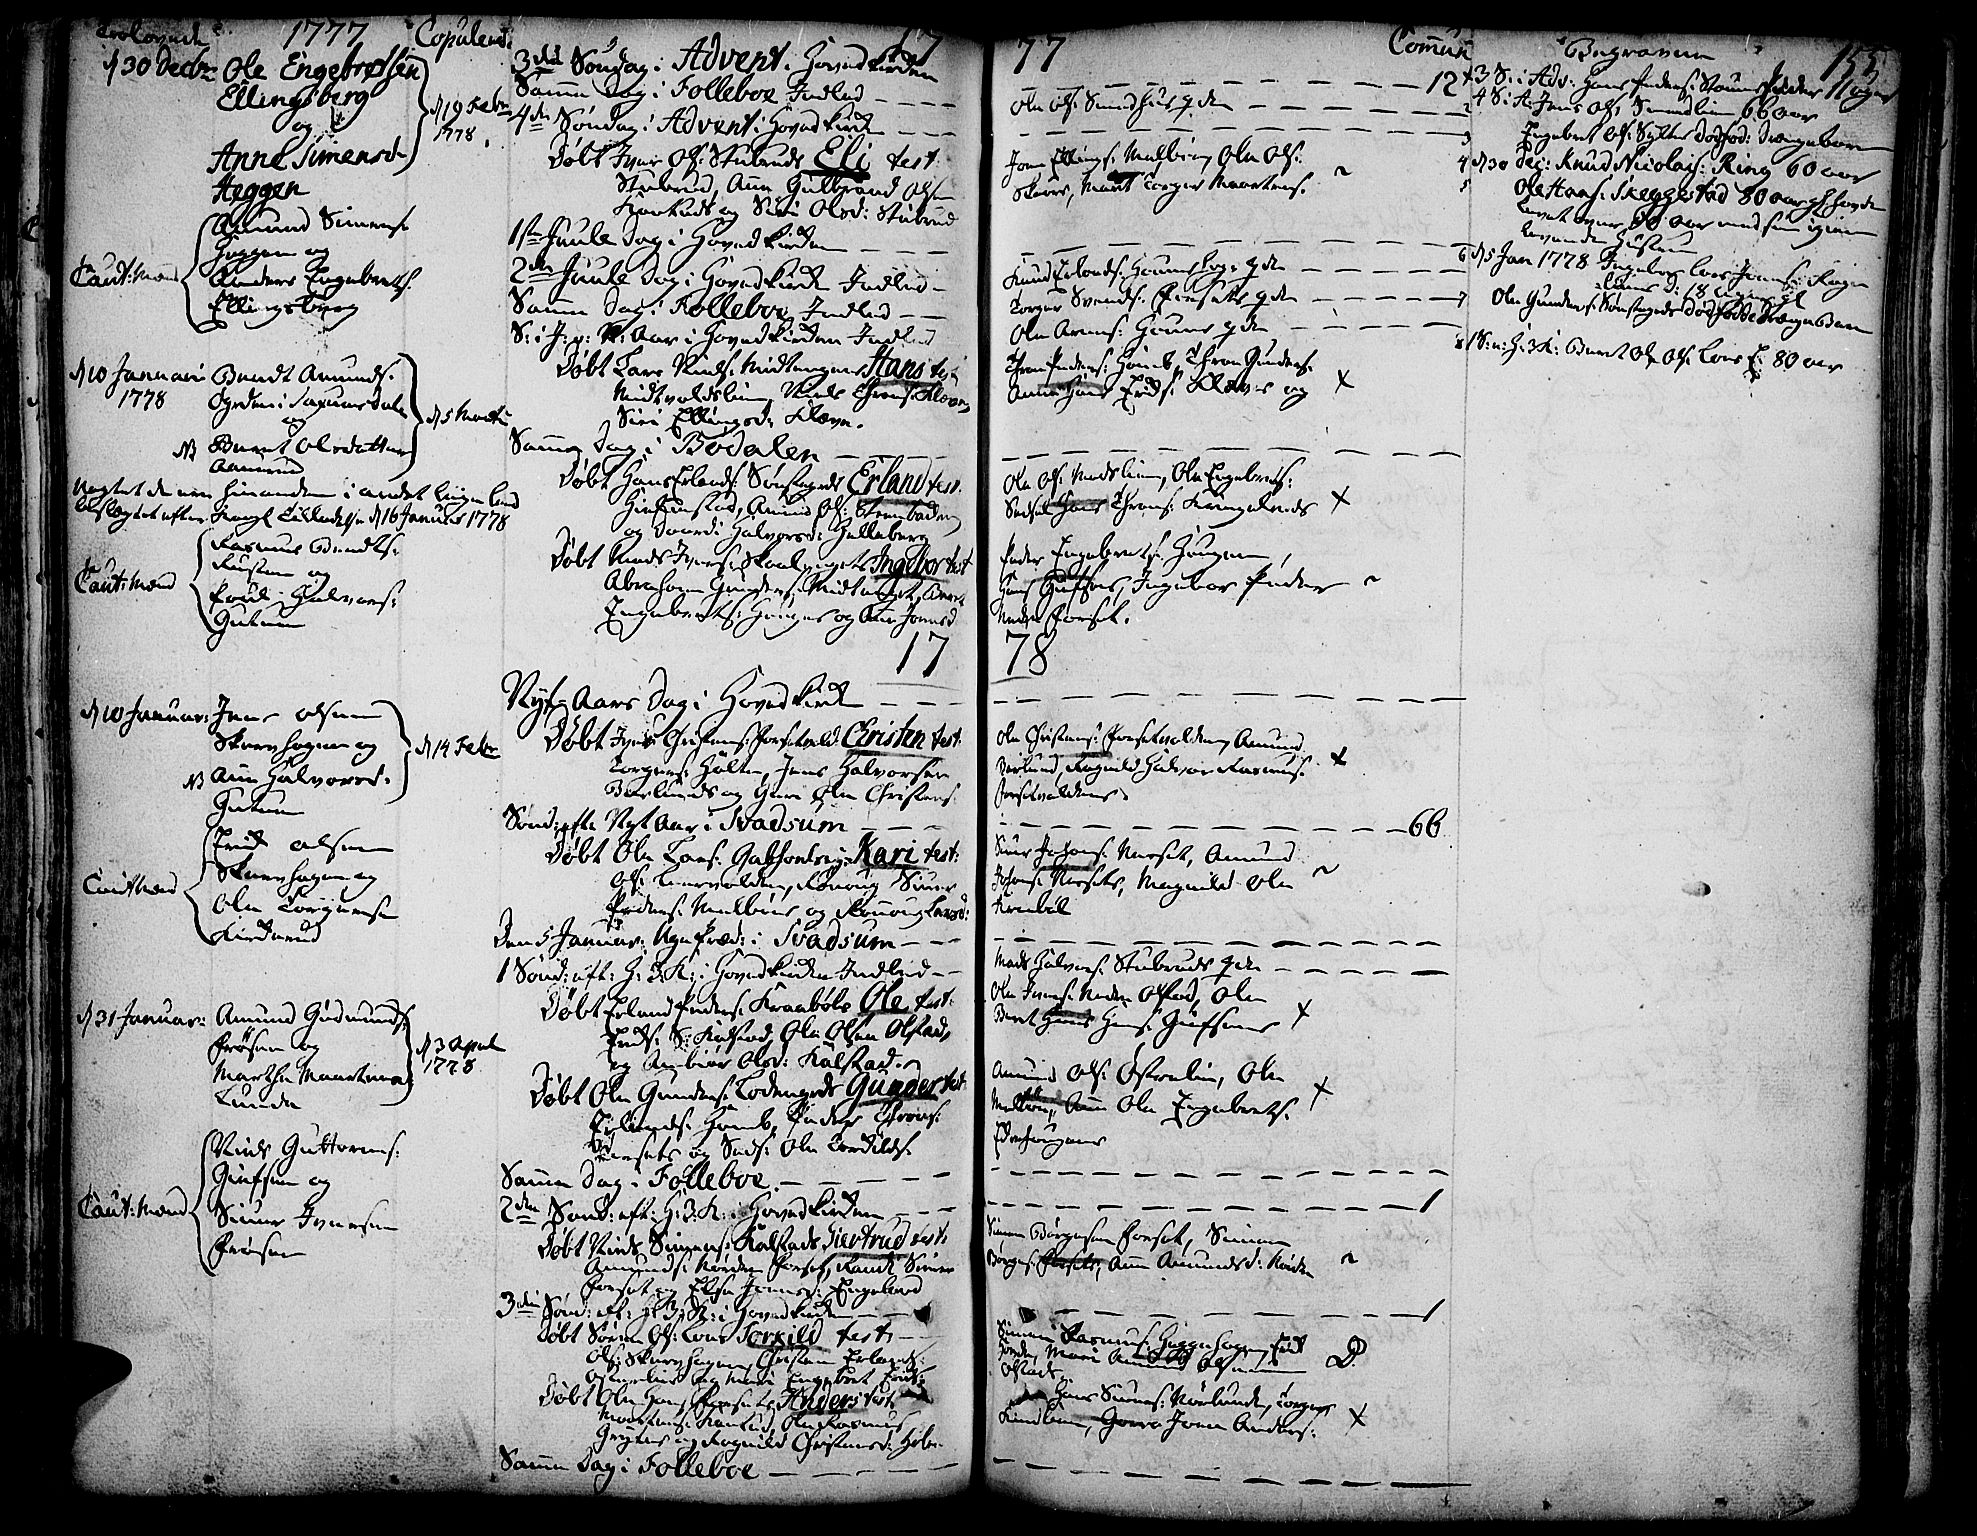 SAH, Gausdal prestekontor, Ministerialbok nr. 3, 1758-1809, s. 155